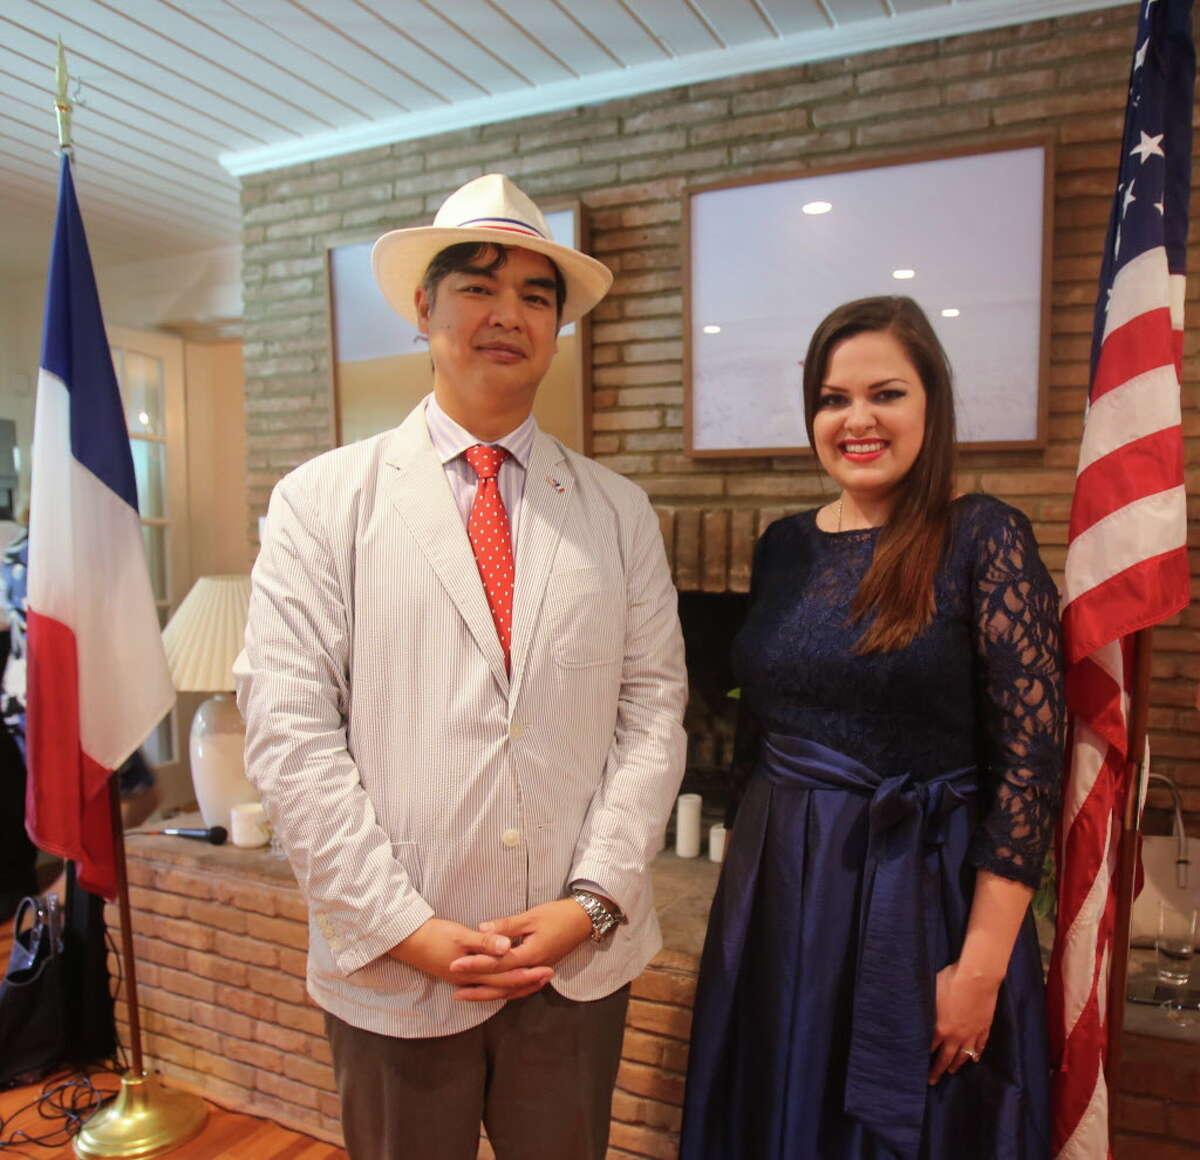 French Consul General Sujiro Seam and Renee Porter